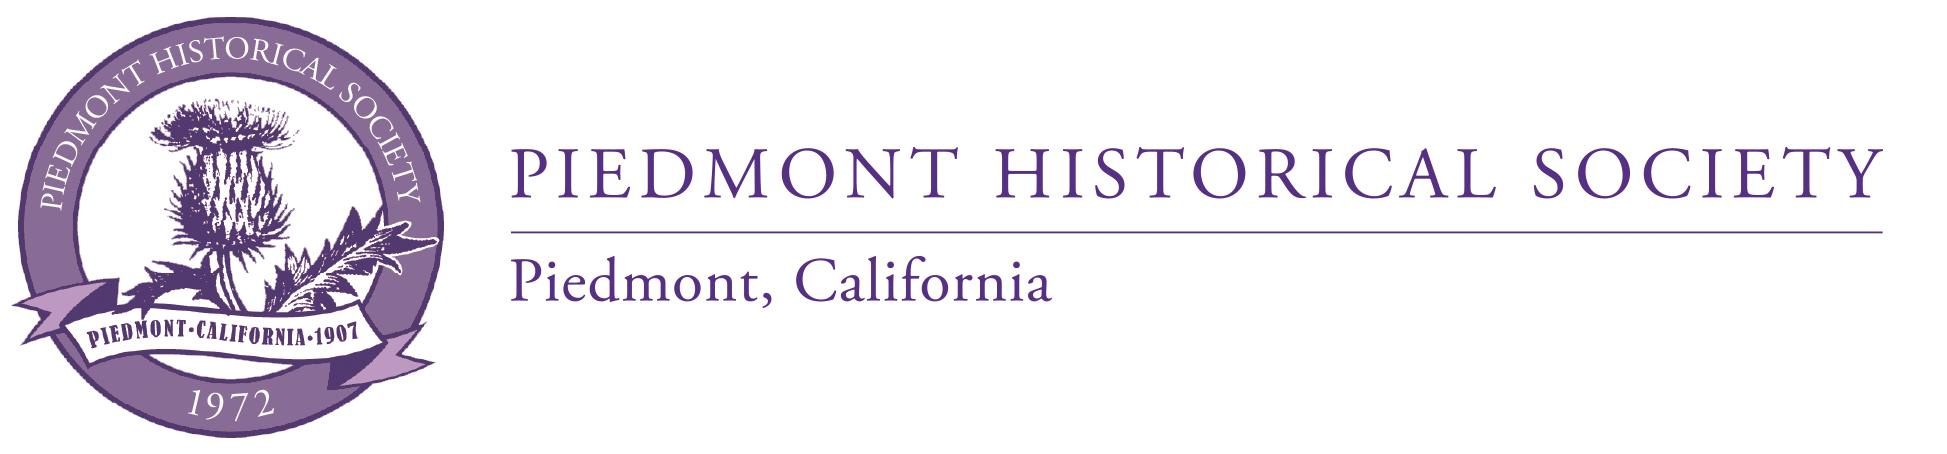 Piedmont Historical Society - Piedmont, California